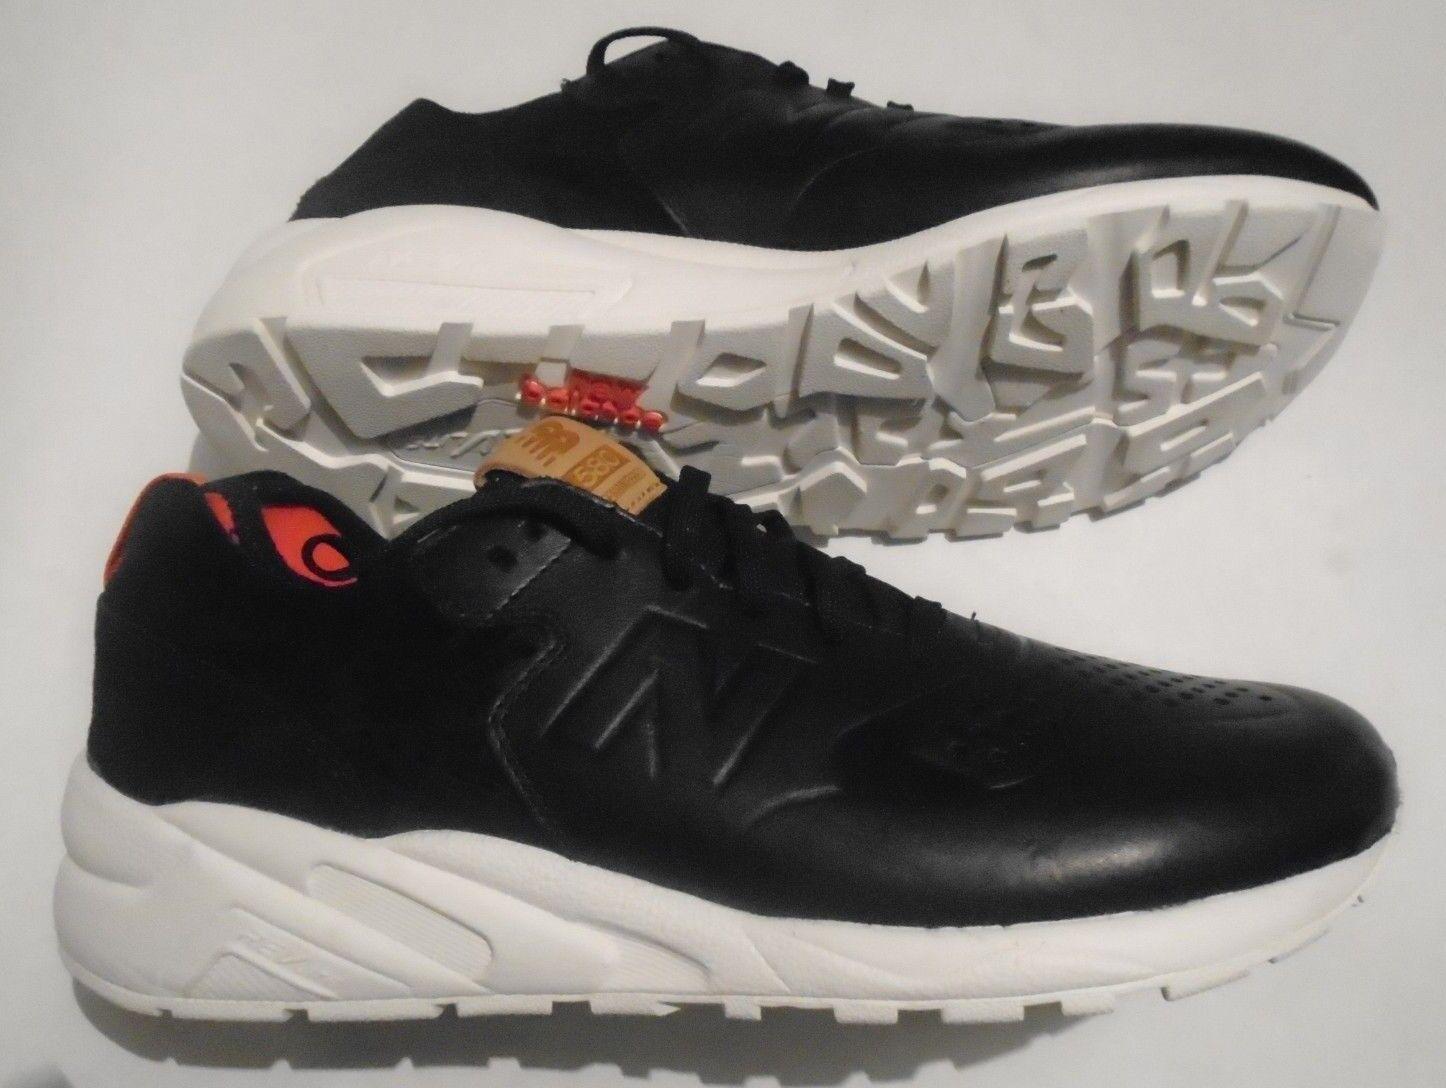 Nuevo NB New 580 Deconstructed Para Hombres 10 Balance Zapatos Negro Rojo Crema MRT580DK